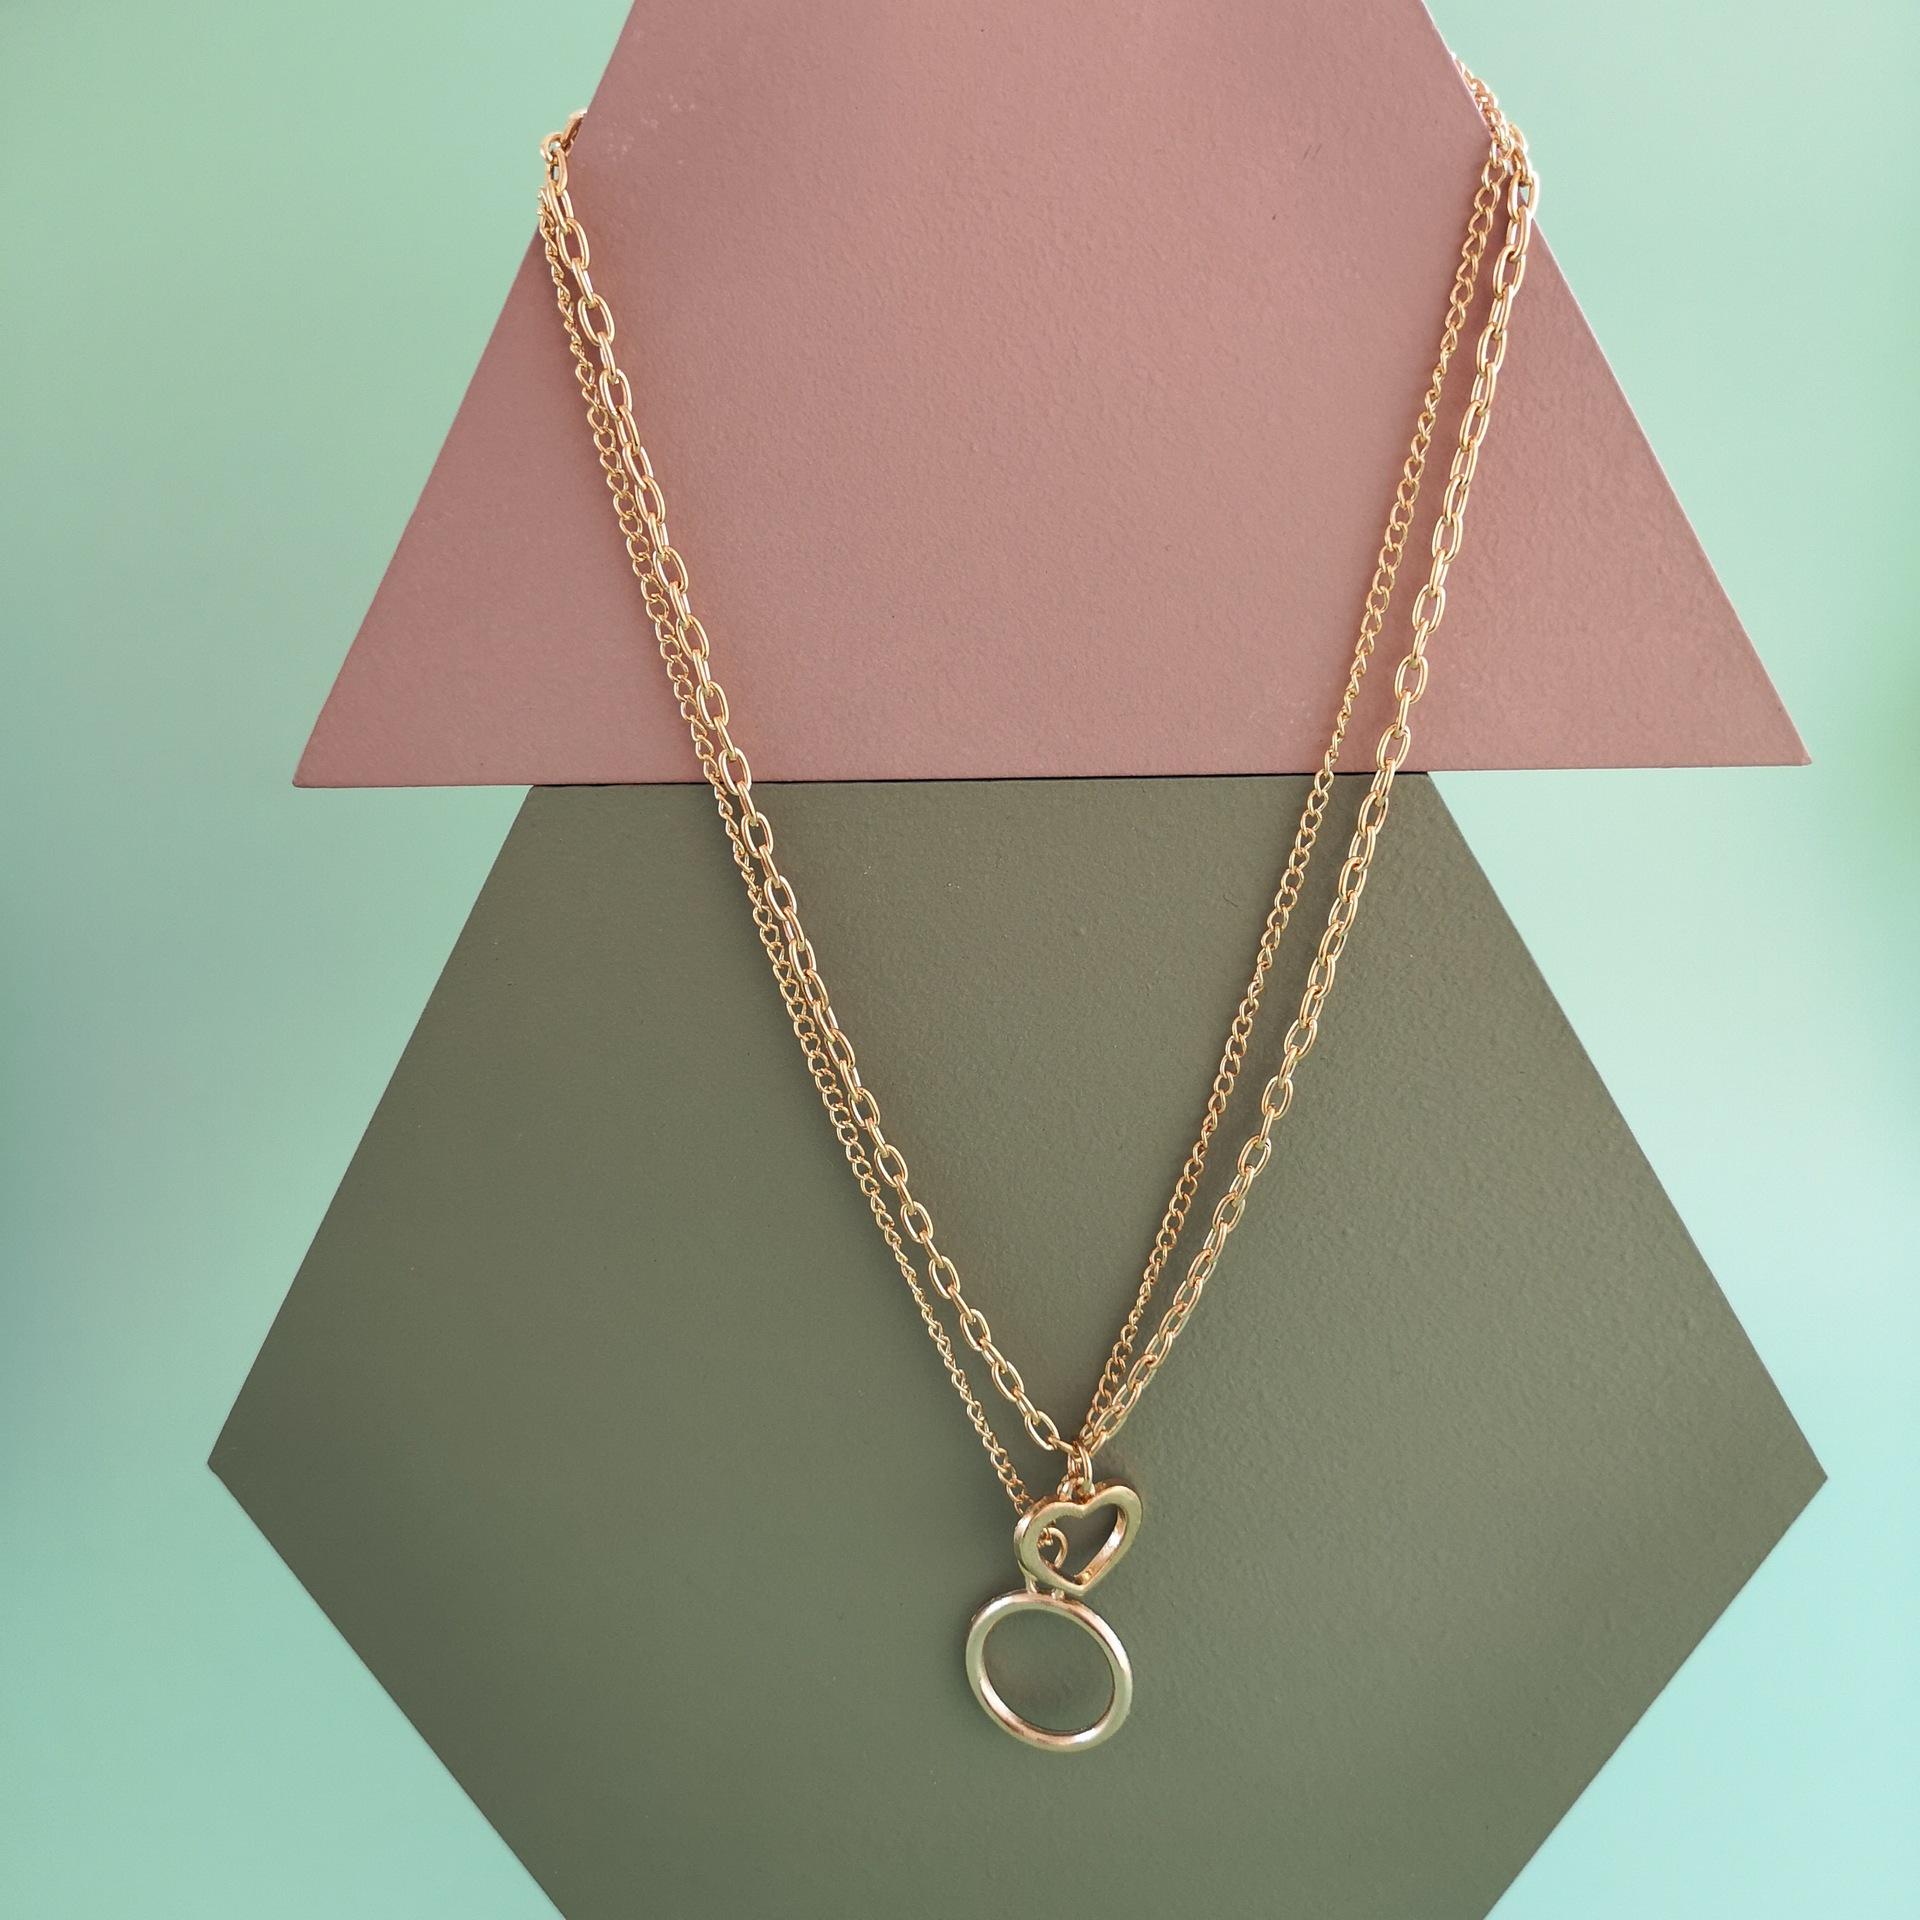 New fashion doublelayer retro hollow hollow round geometric necklace pendant for women wholesale NHJJ210528